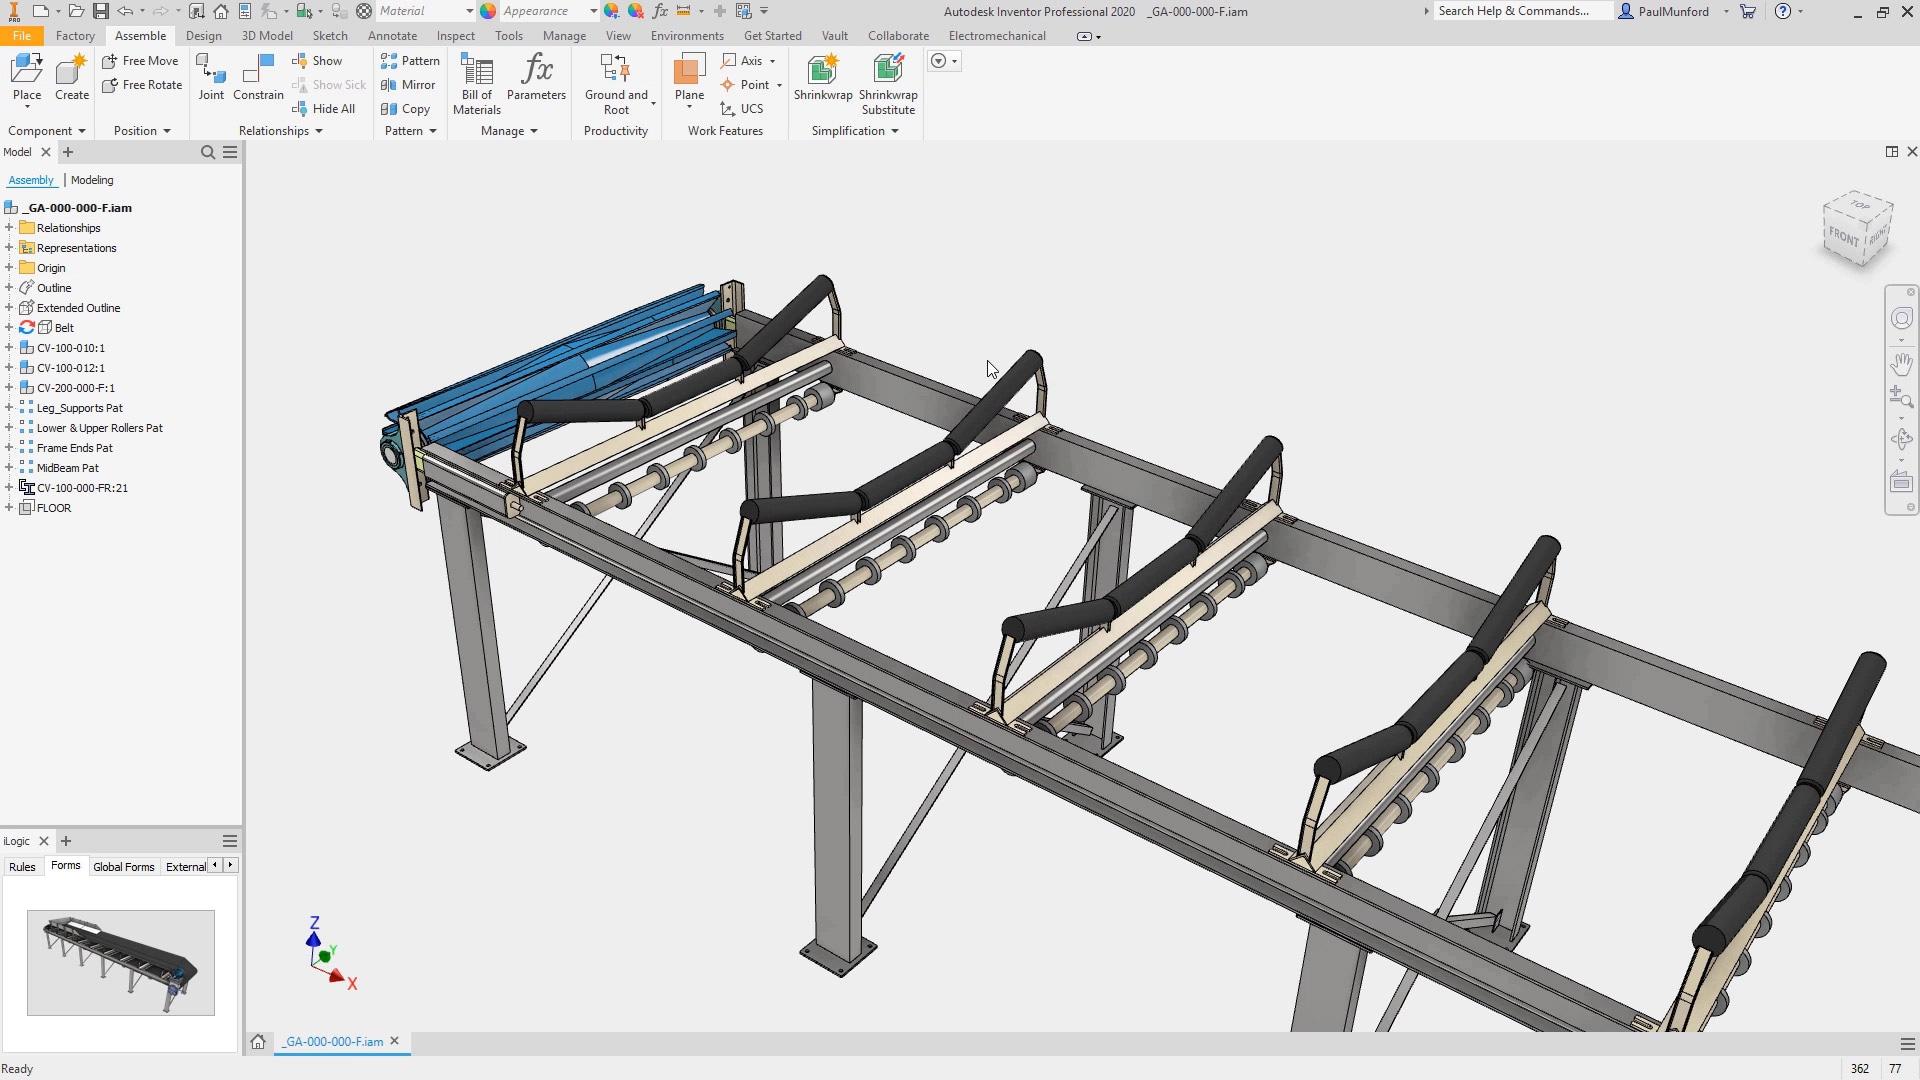 Awe Inspiring Inventor Software Fur Mechanische 3D Konstruktion Und 3D Download Free Architecture Designs Embacsunscenecom